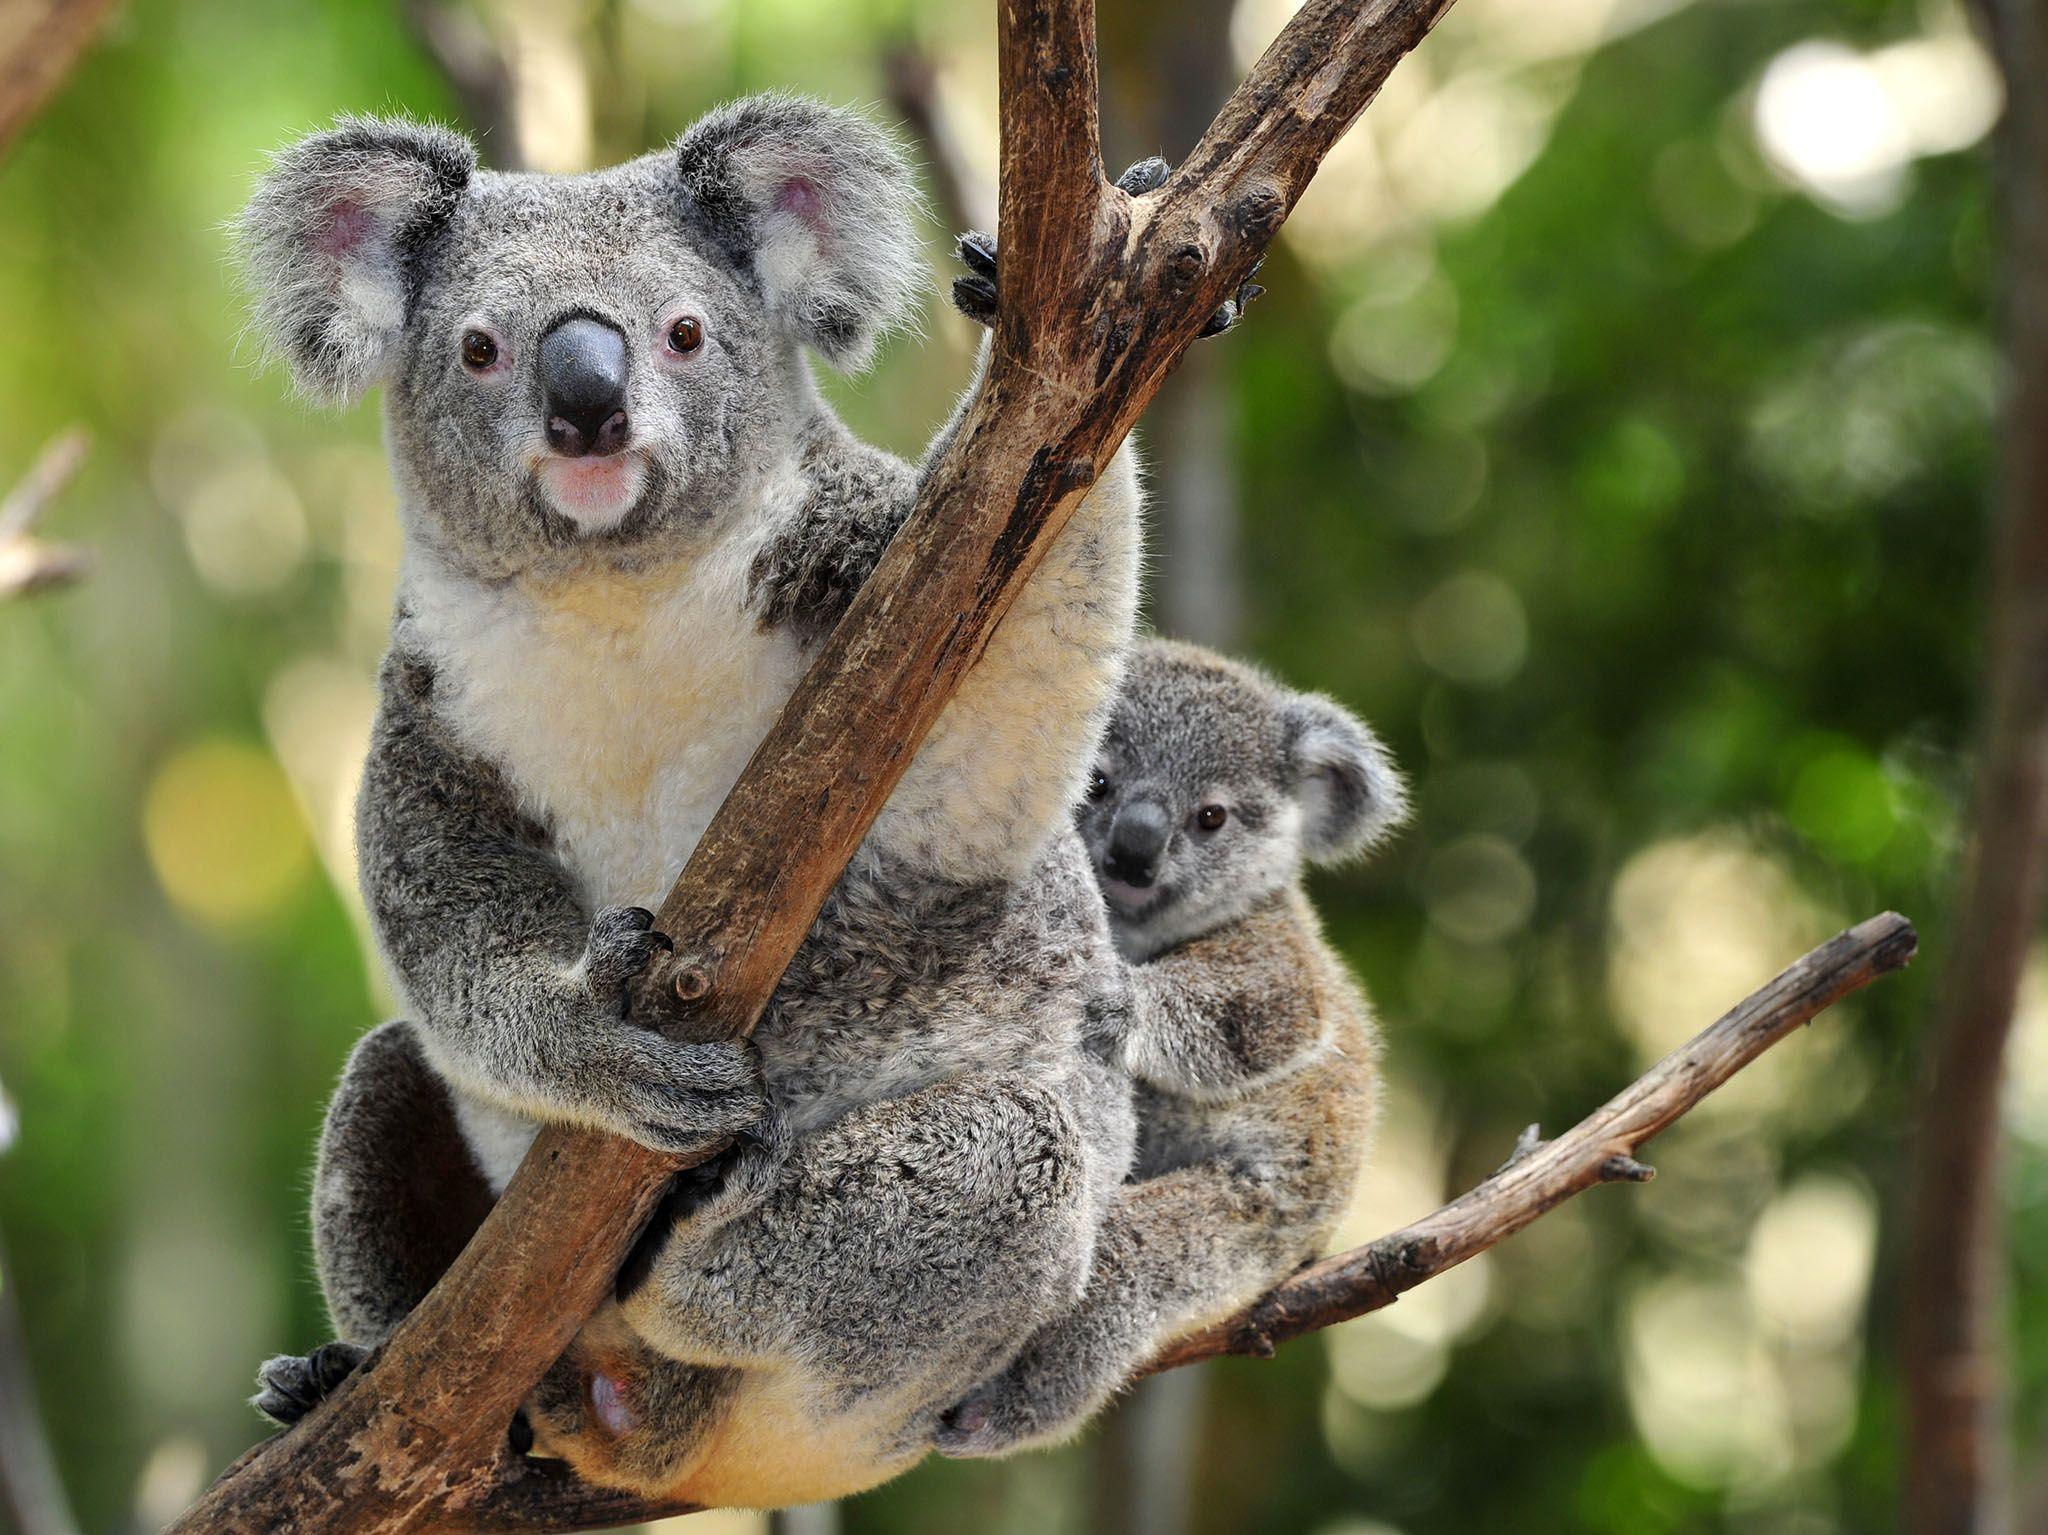 Sydney, Australia: Australian koala bear with her baby or joey in eucalyptus or gum tree,... [Photo of the day - March 2017]